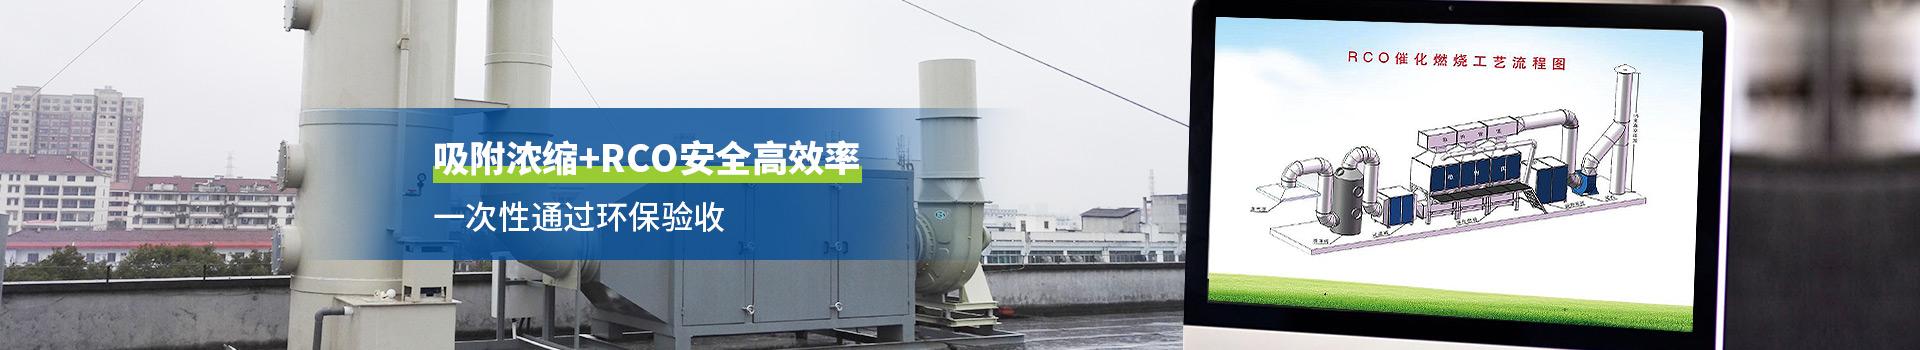 VOCs废气处理 一次性通过环保验收